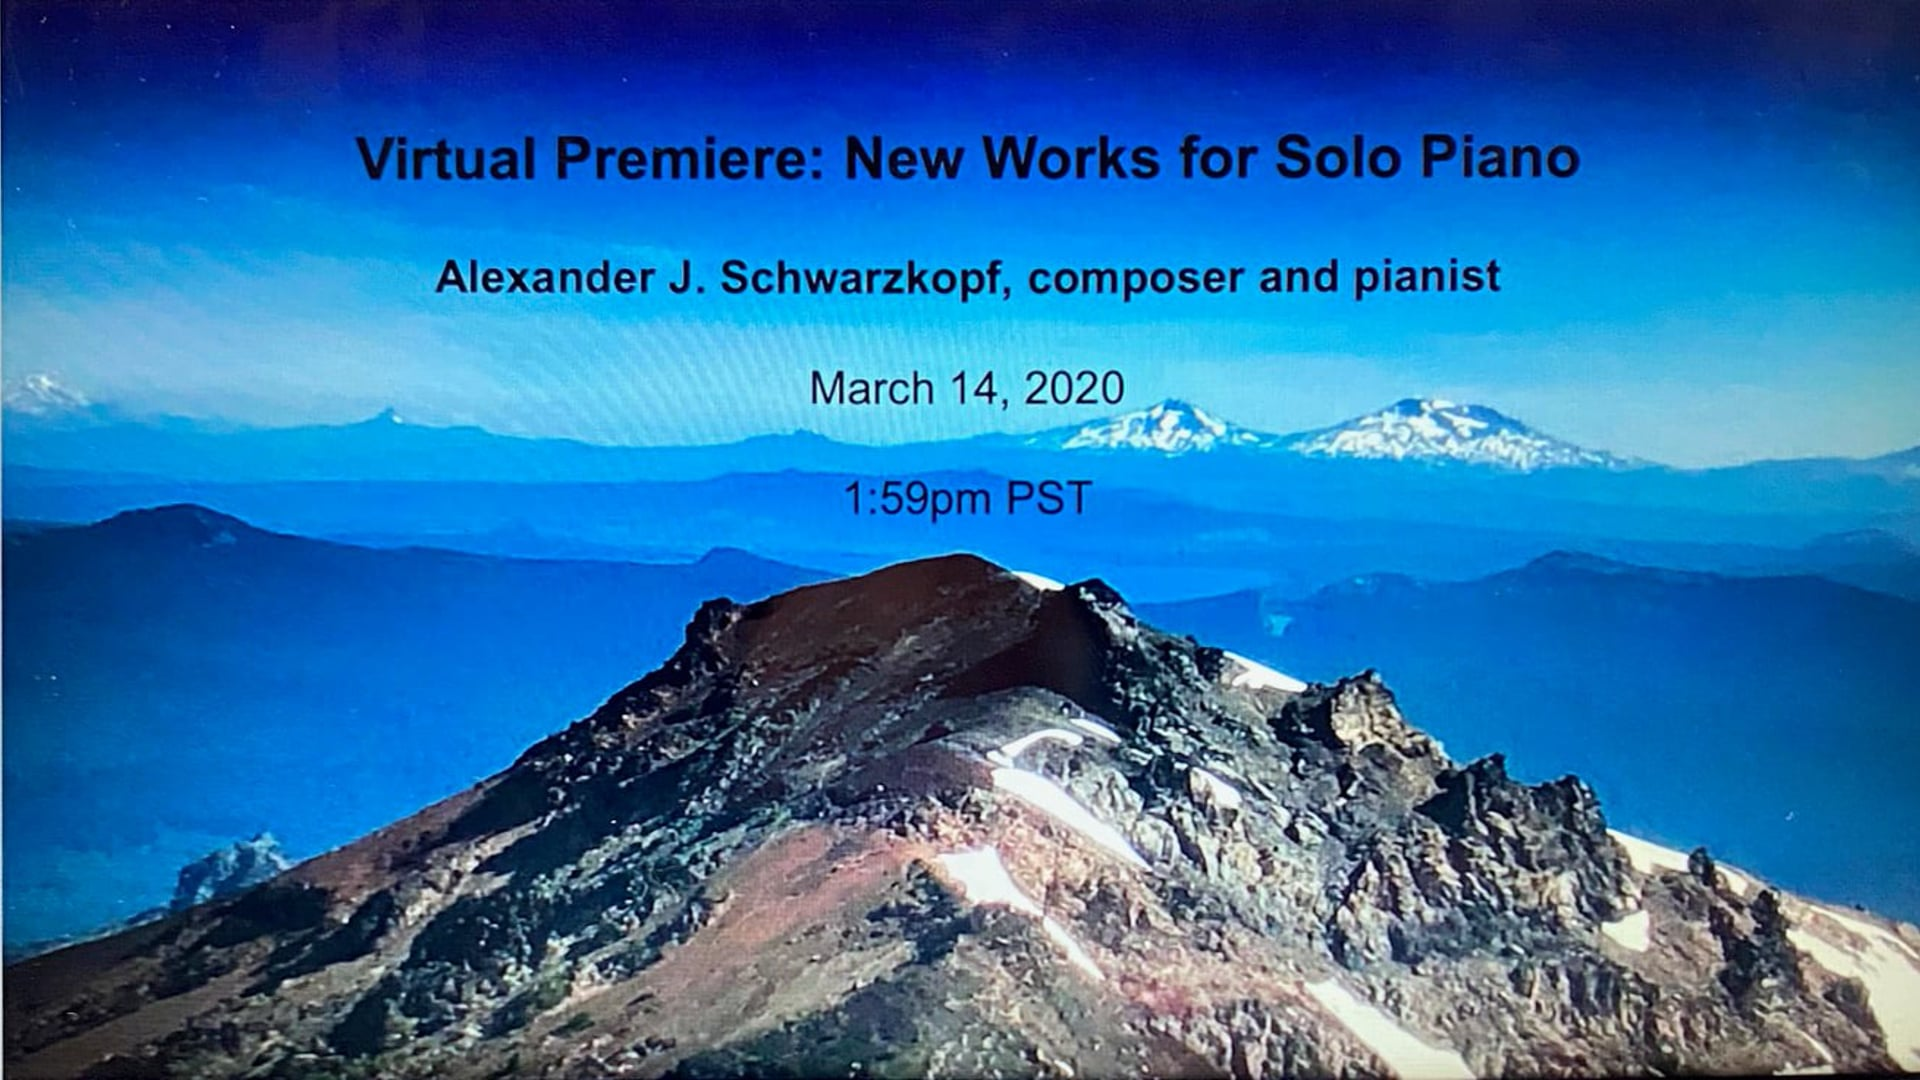 Alexander Schwarzkopf: Musical Reflections during Pandemic